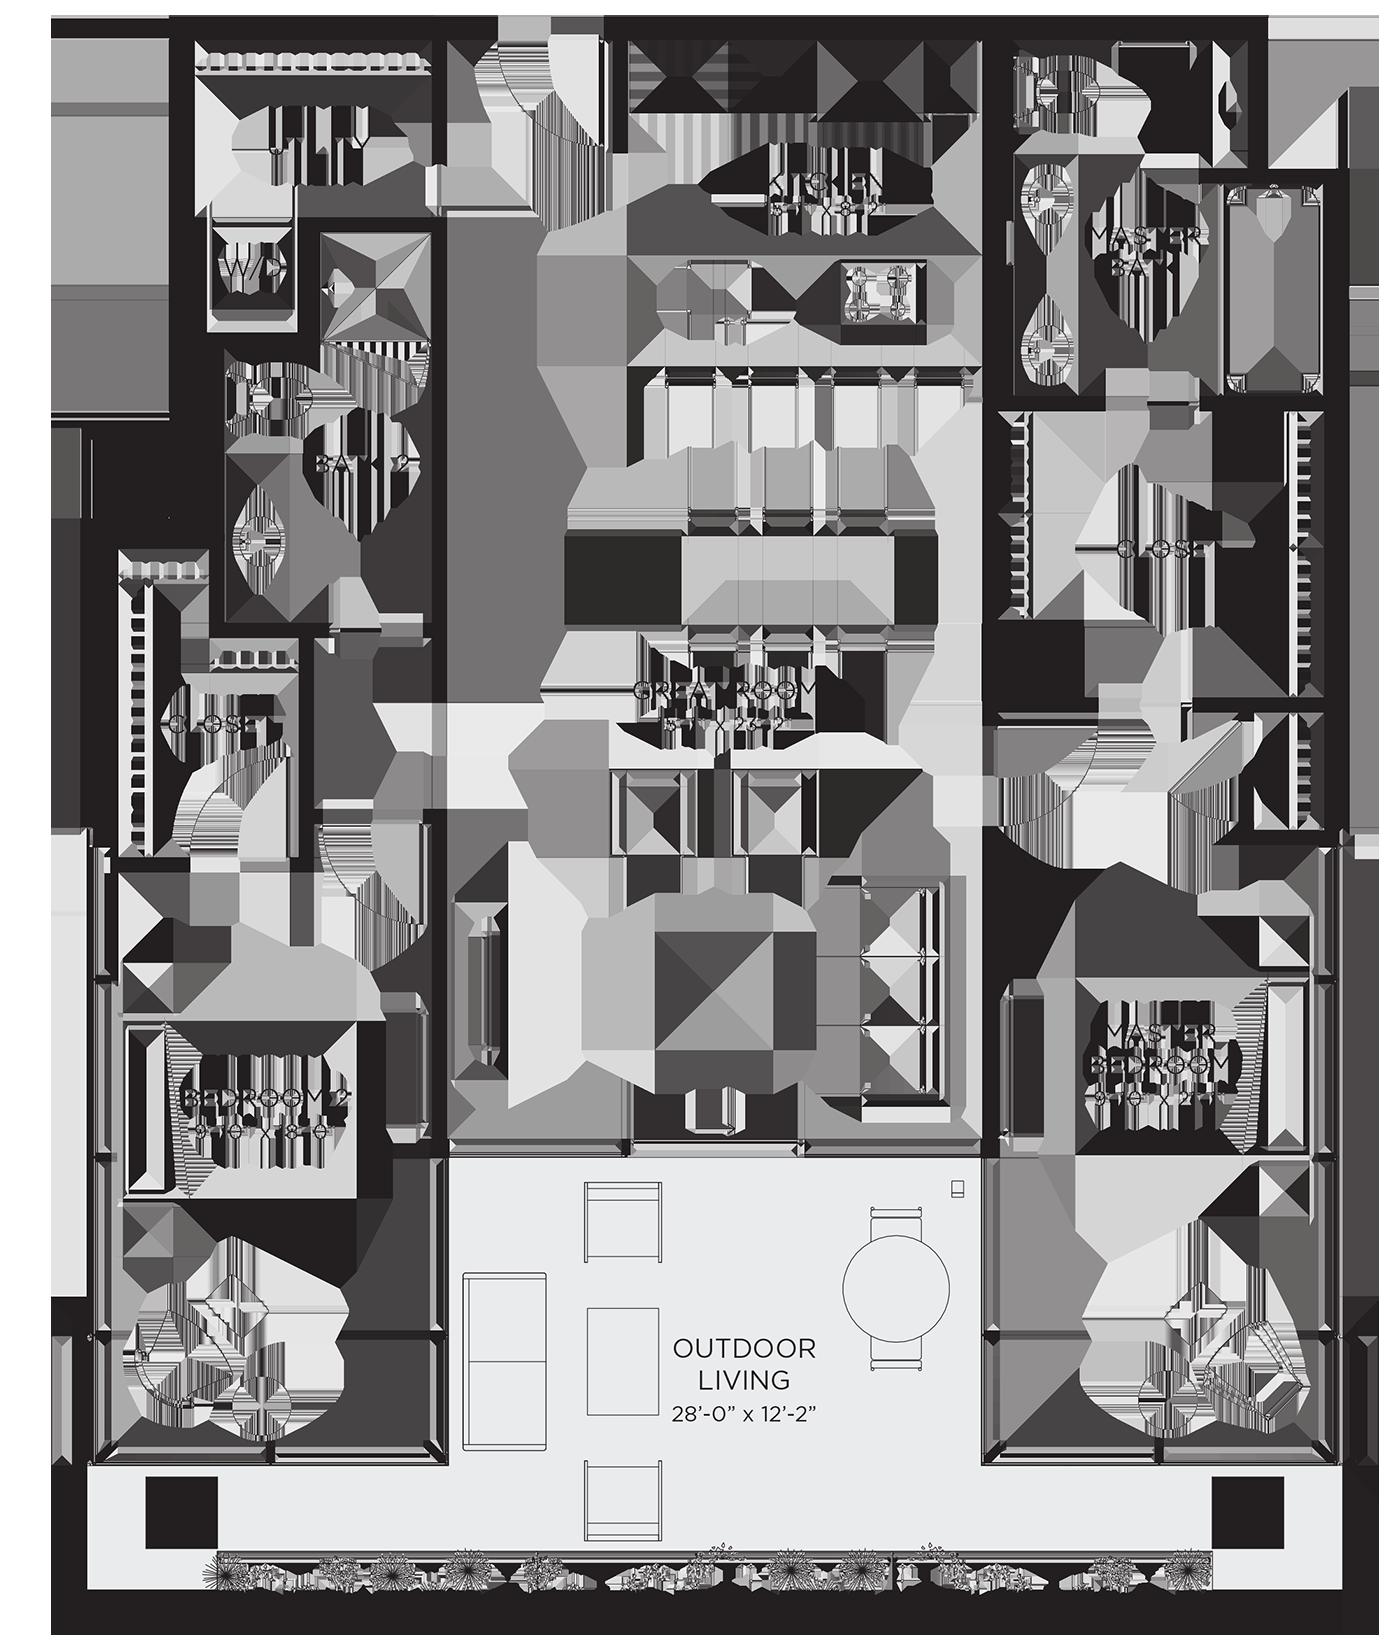 Unit 02Fa Floor Plan